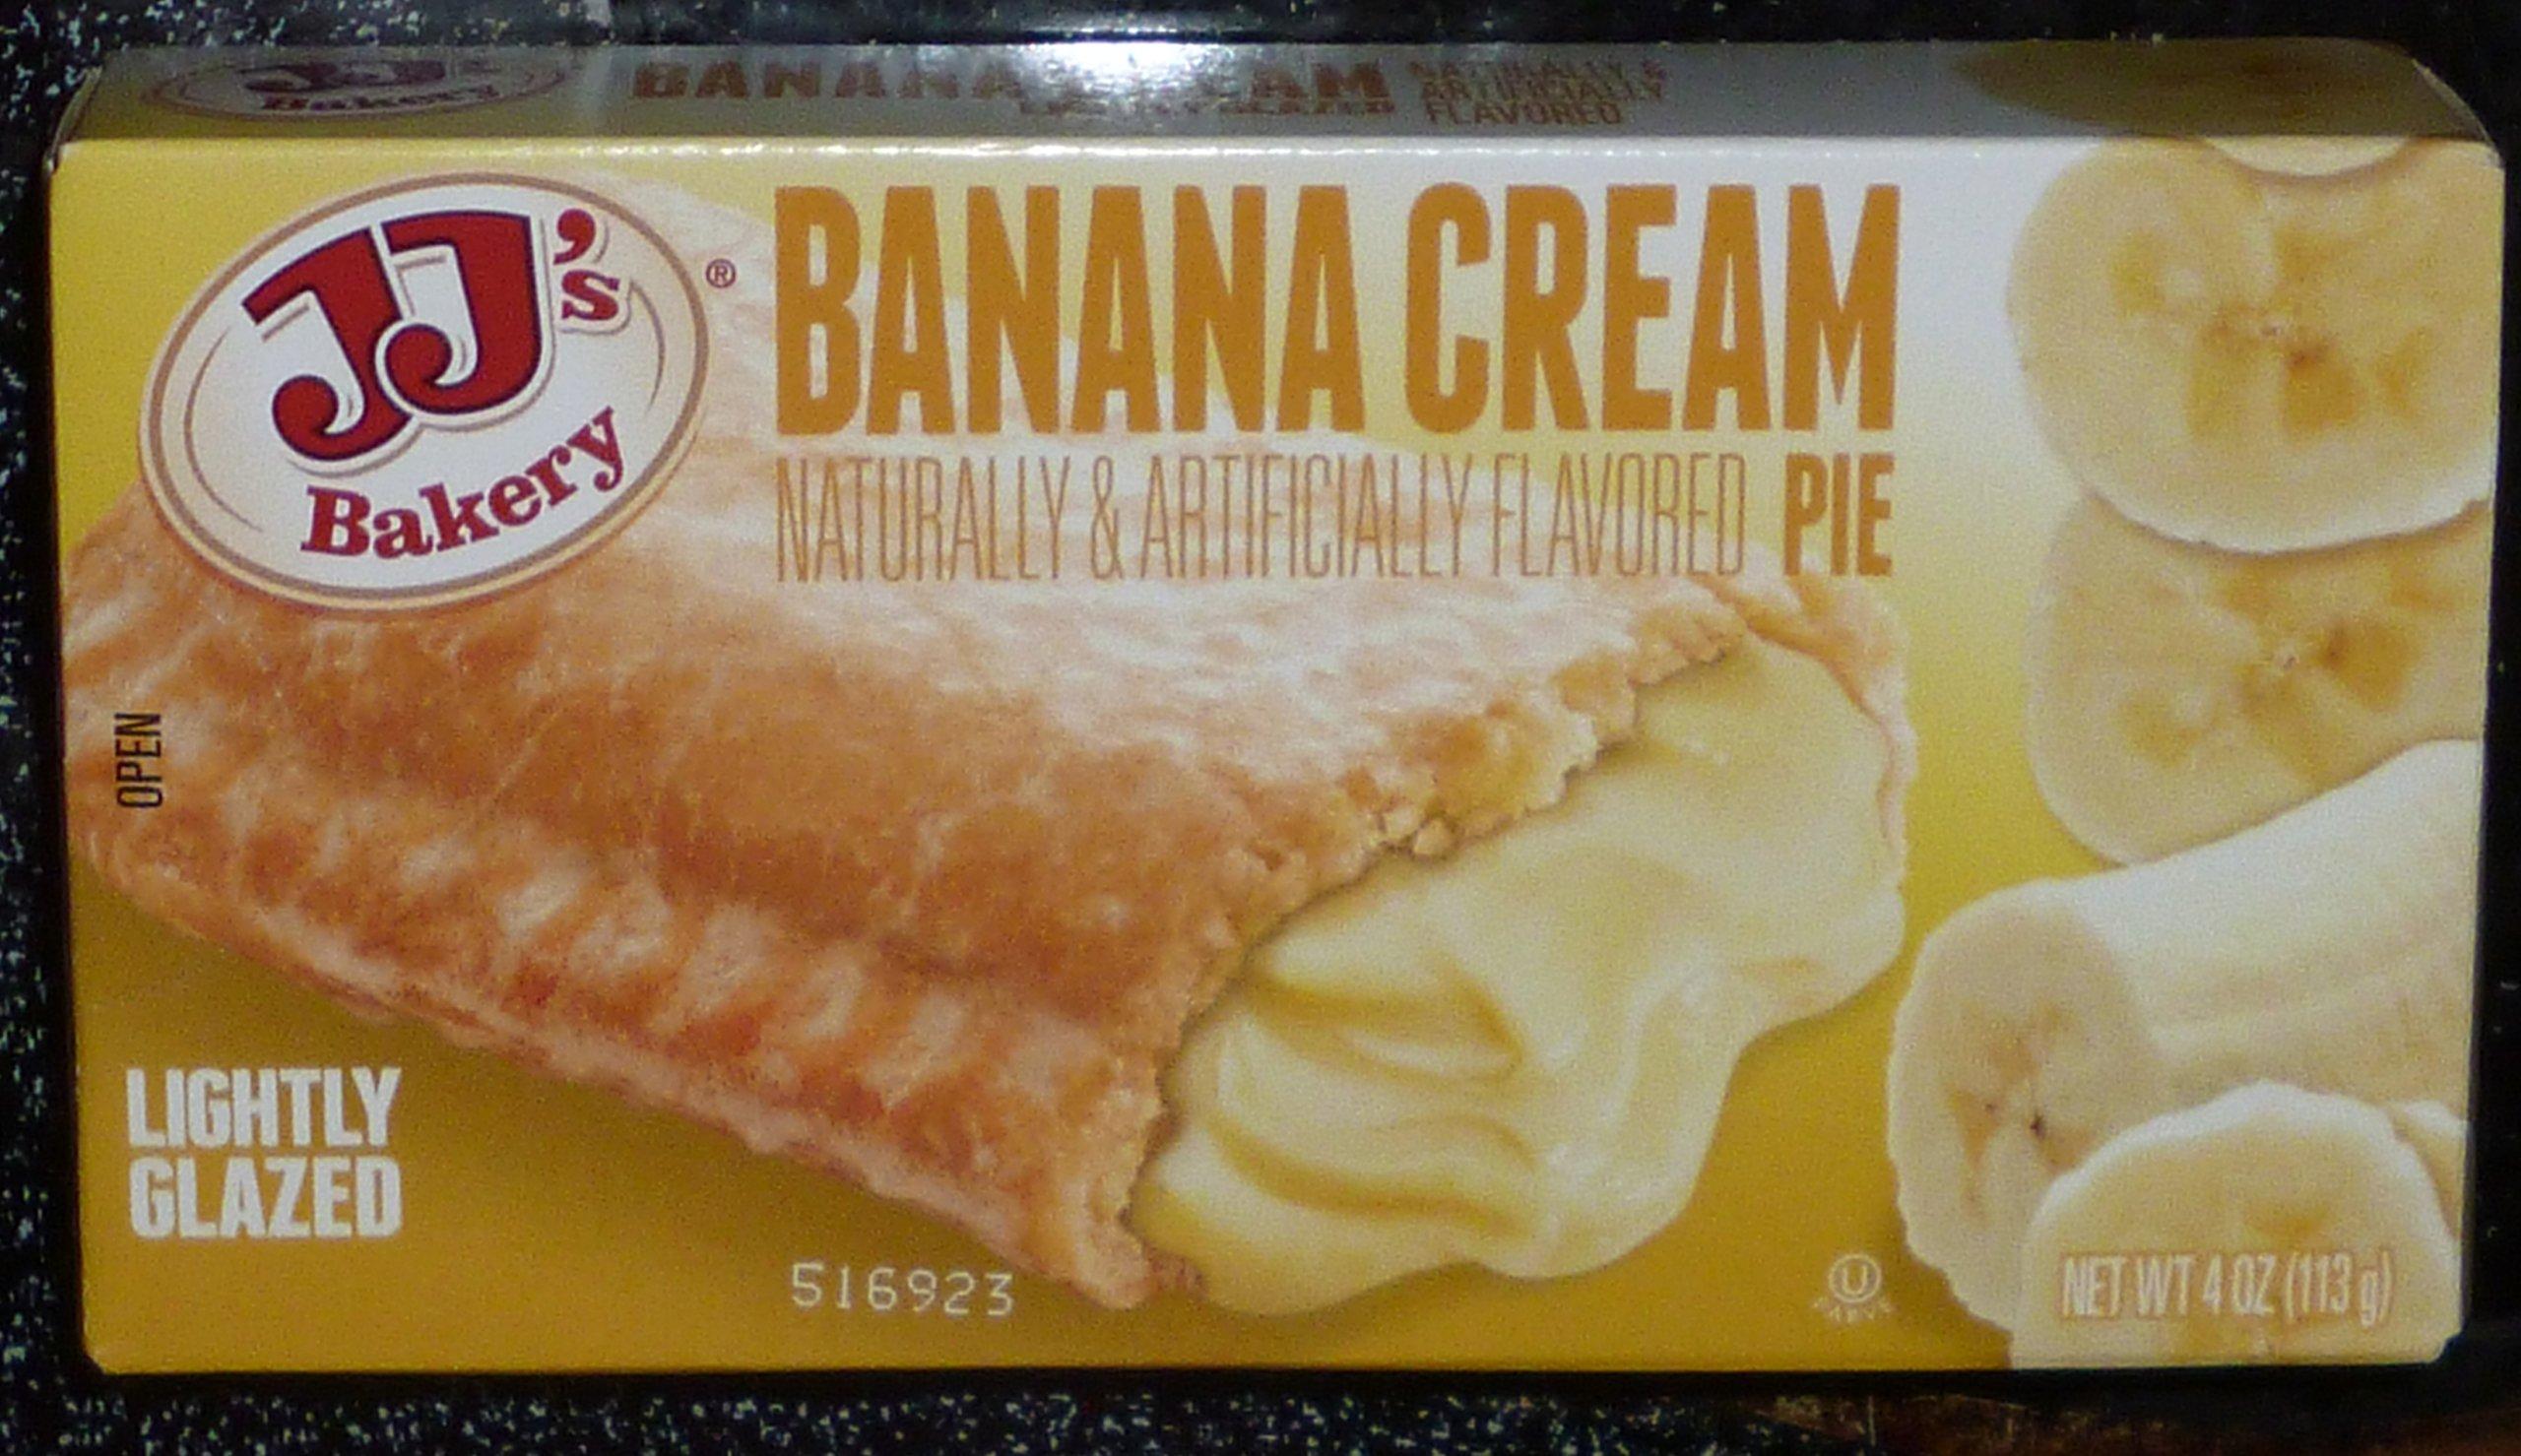 JJs Bakery Lightly Glazed Snack Pies 4oz Pack Of 6 Banana Cream Amazon Grocery Gourmet Food